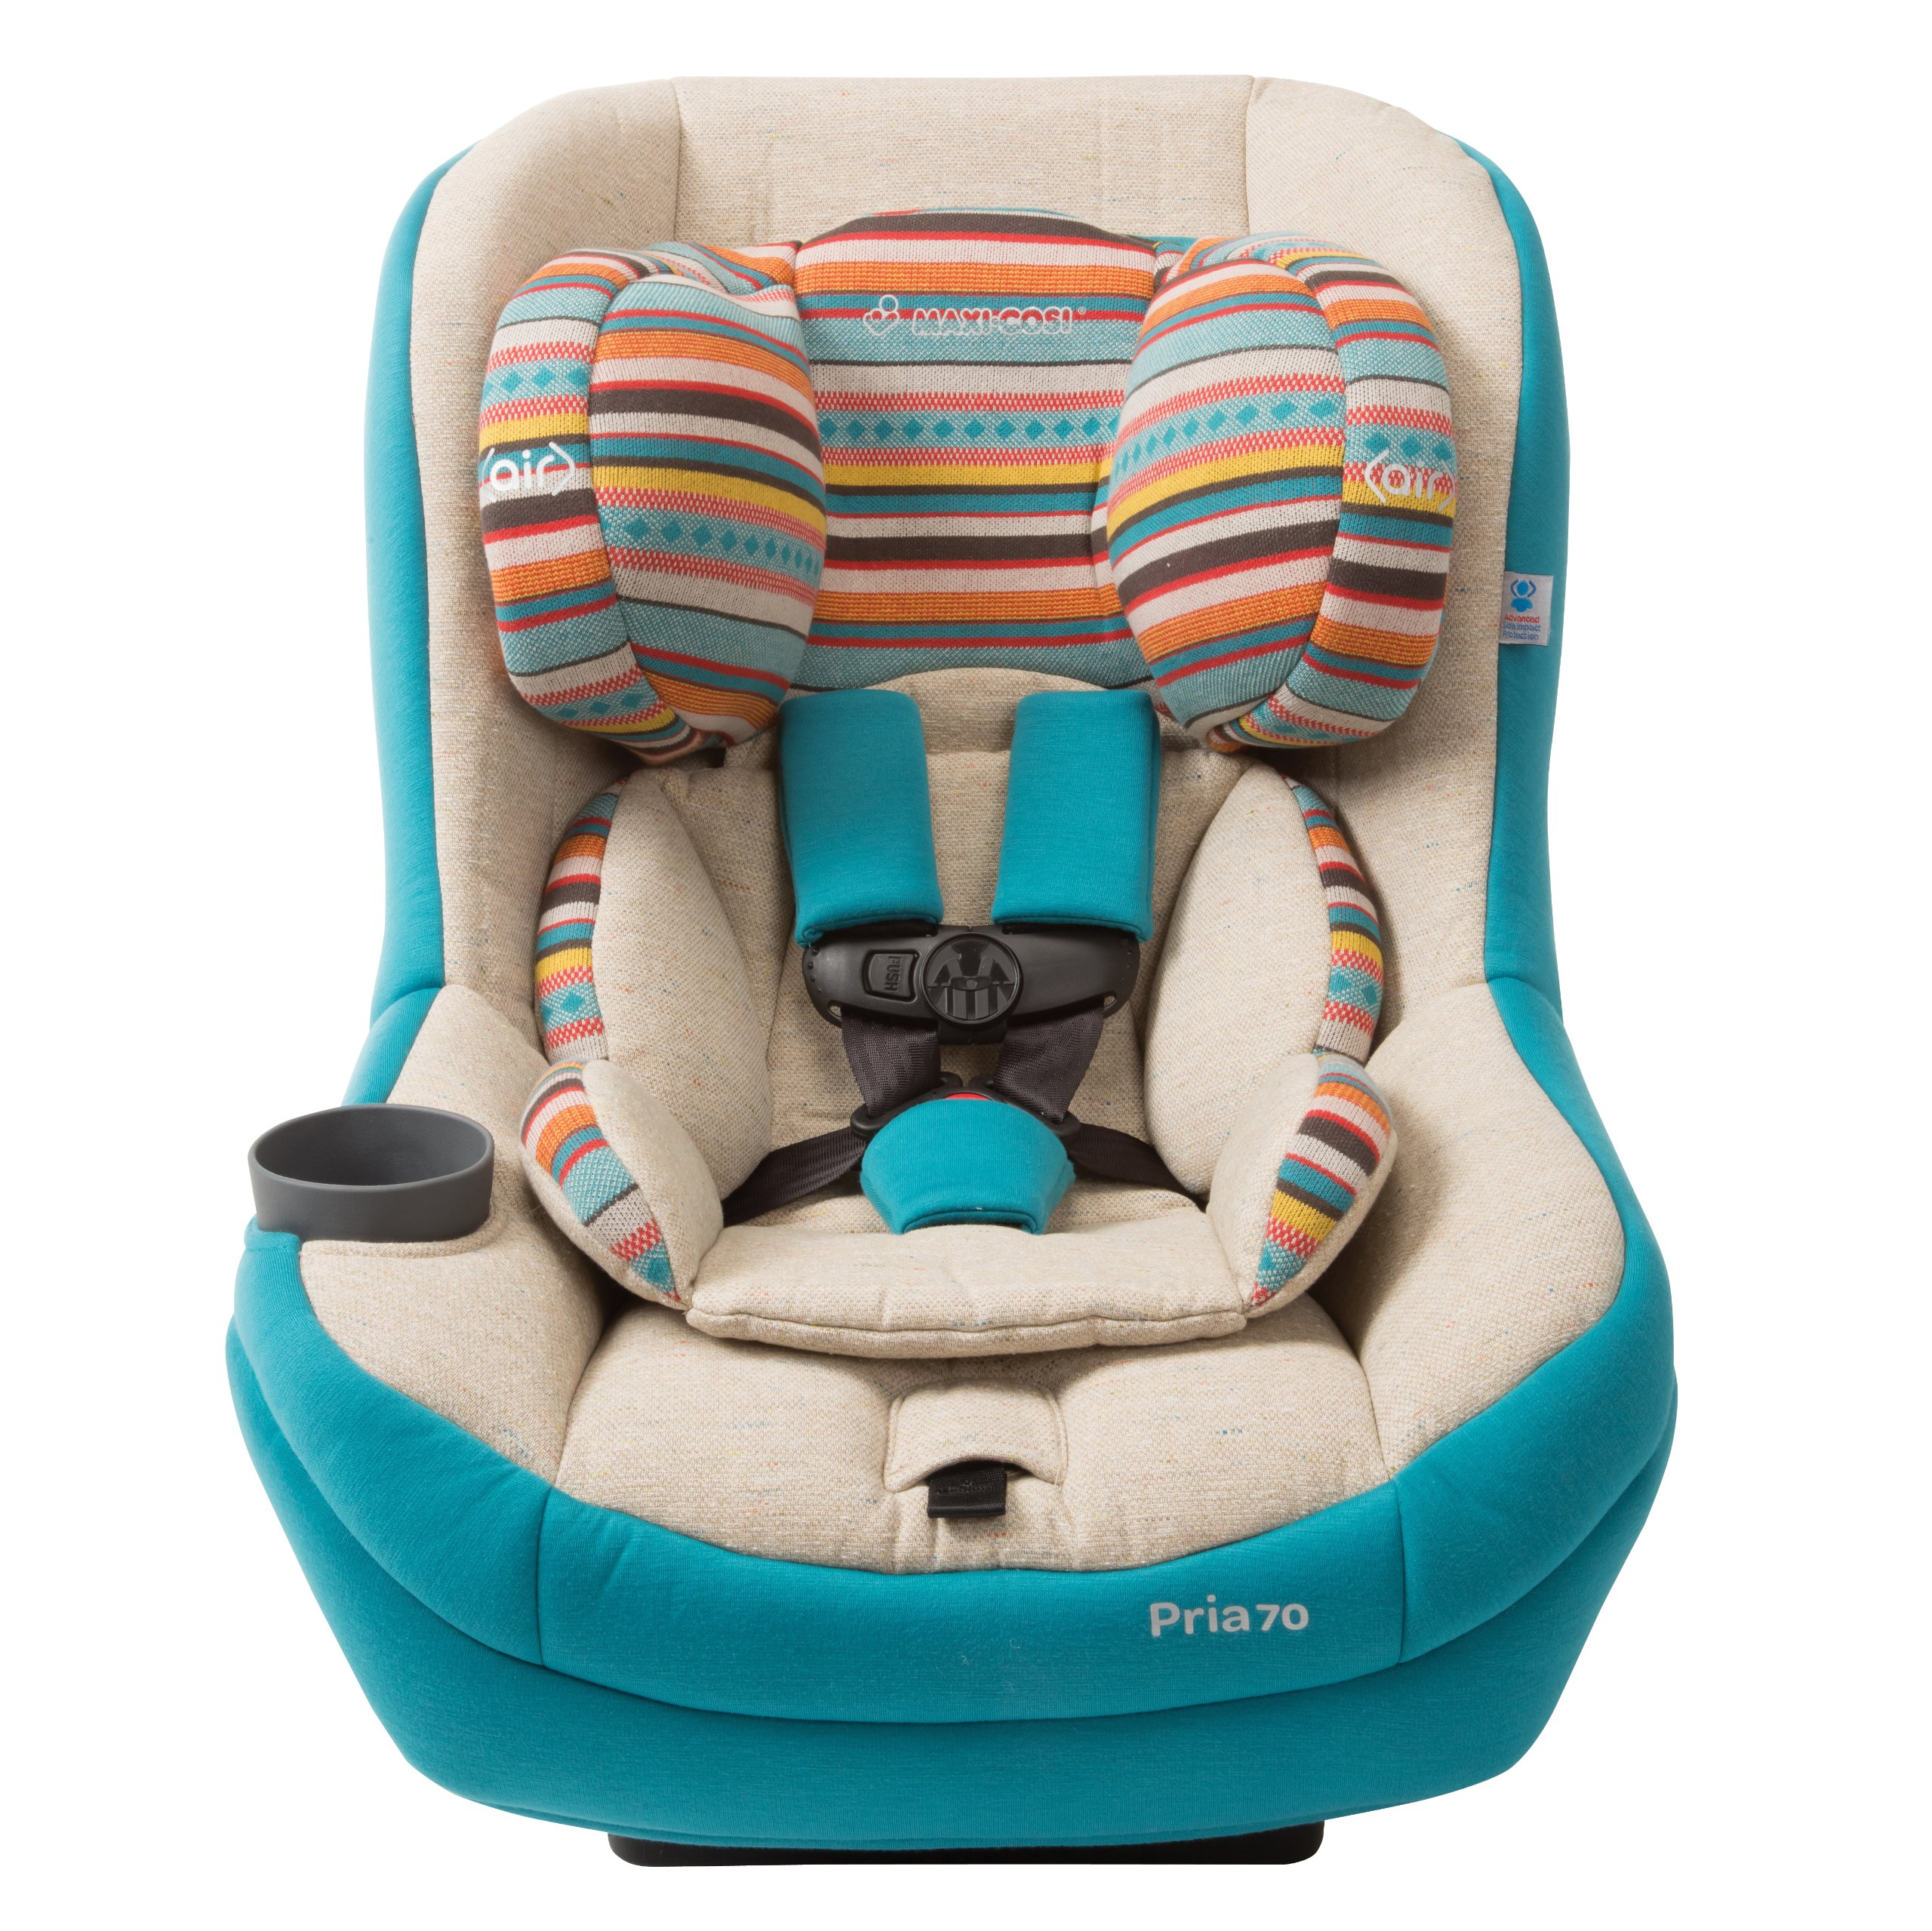 Maxi-Cosi Pria 70 Convertible Car Seat, Bohemian Blue (Discontinued by Manufacturer)